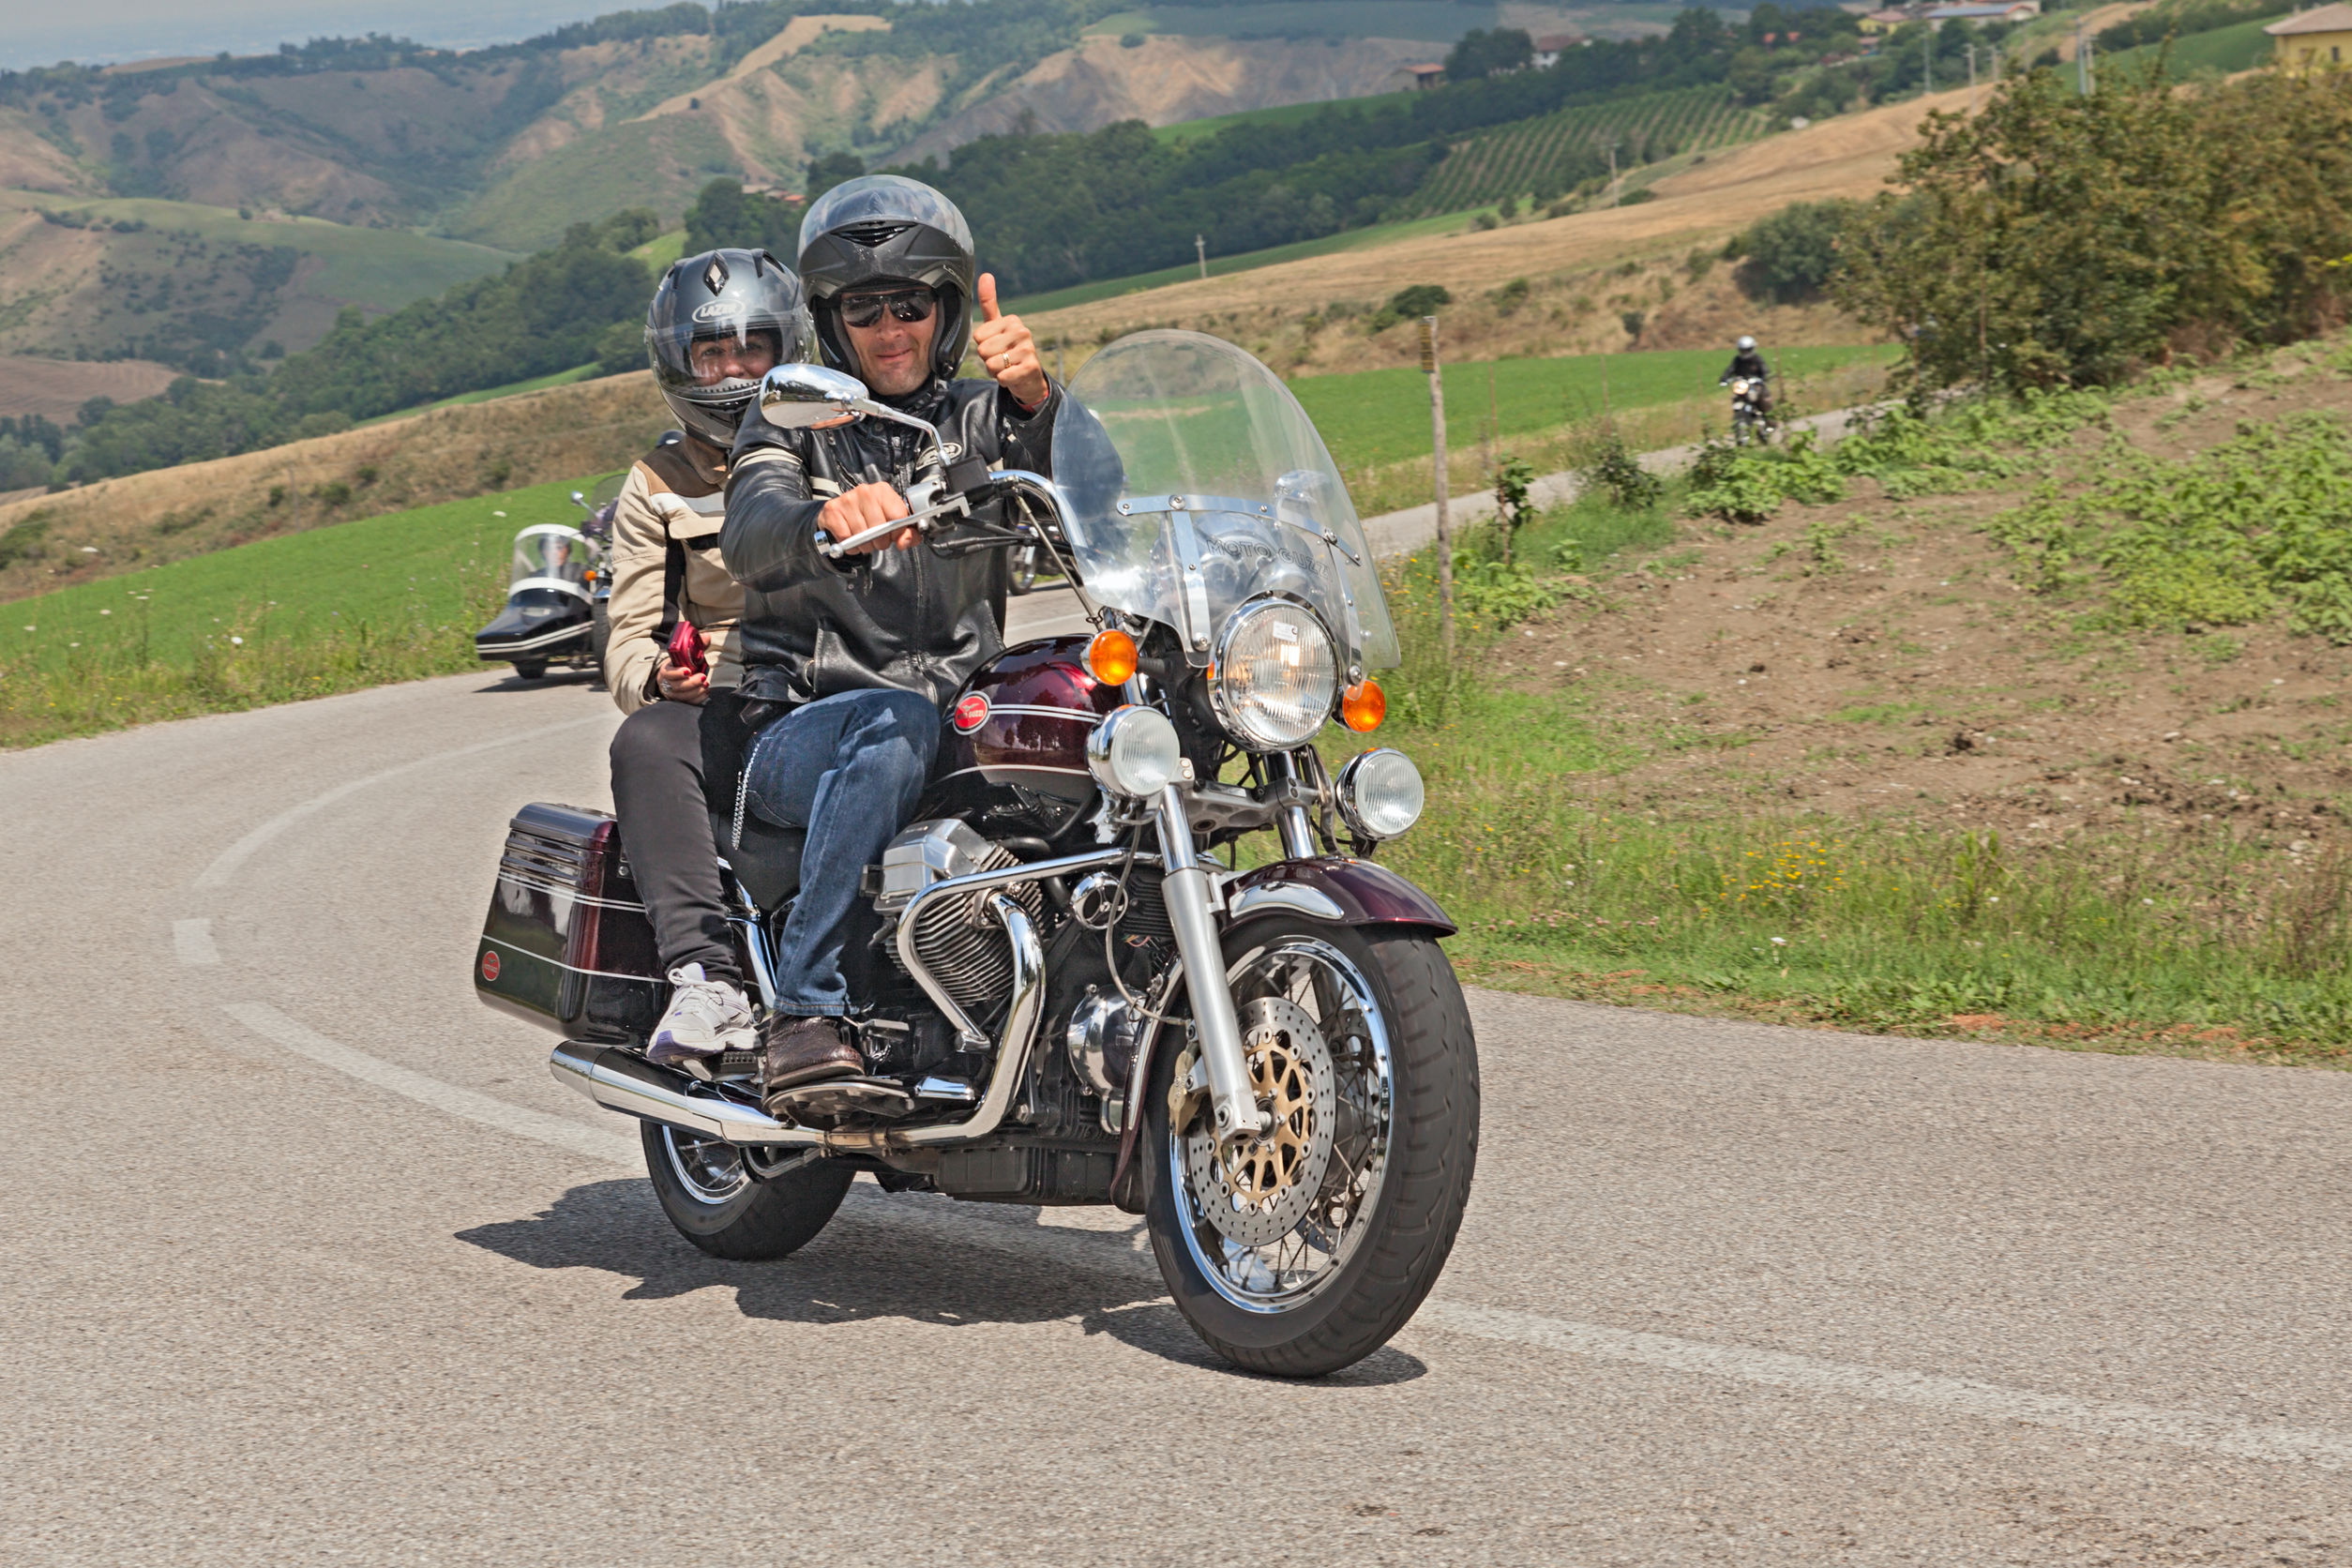 30036861 - couple of bikers riding a vintage italian motorcycle moto guzzi california classic at rally ix moto guzzi memorial zigolo on july 13, 2014 in meldola, fc, italy